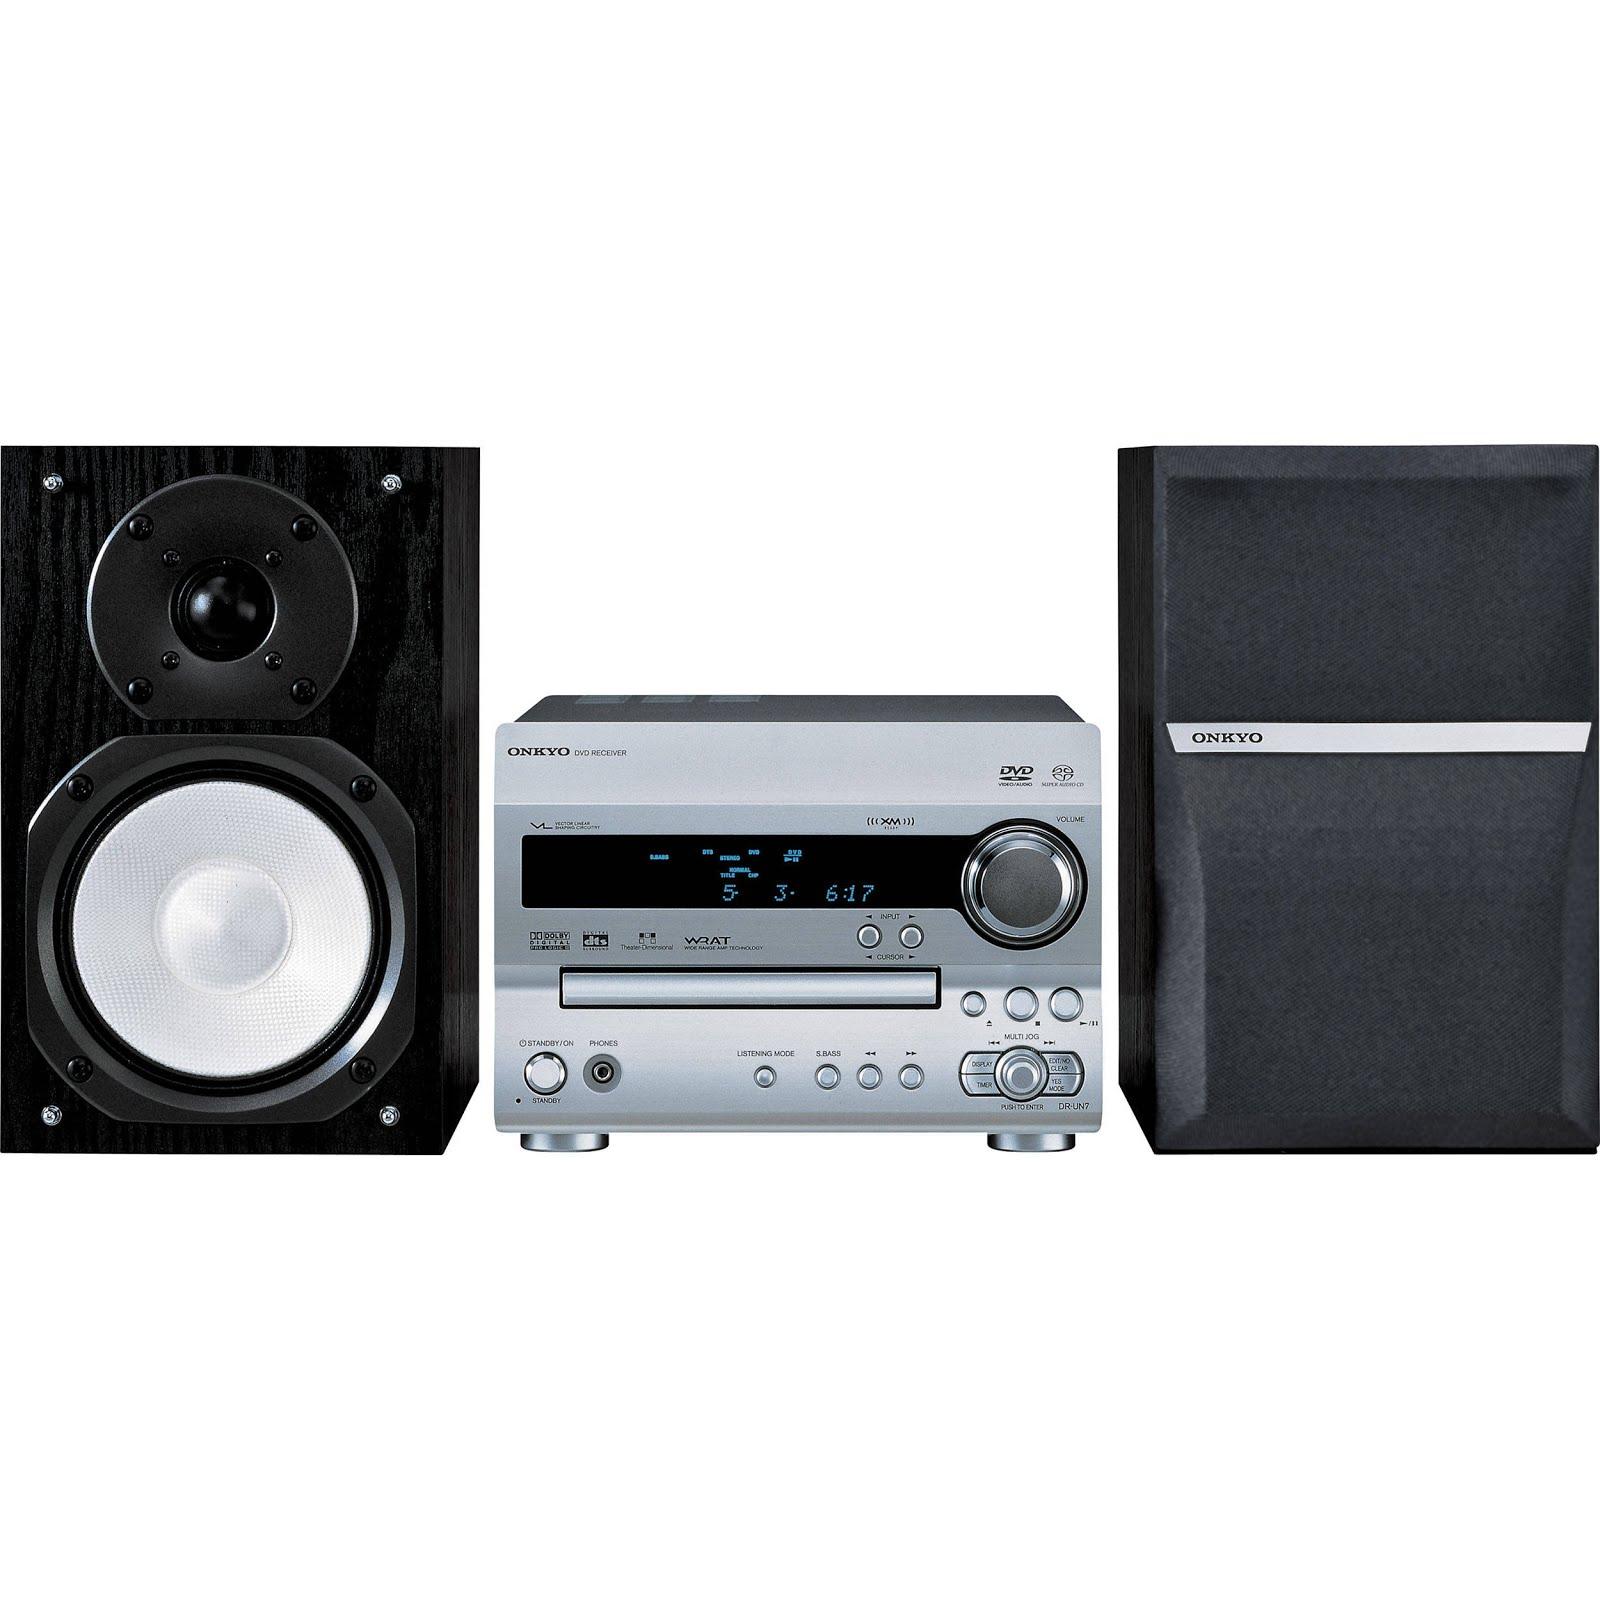 Hifi Stereo Systems Technics Sc Hd505 Mini Stereo System